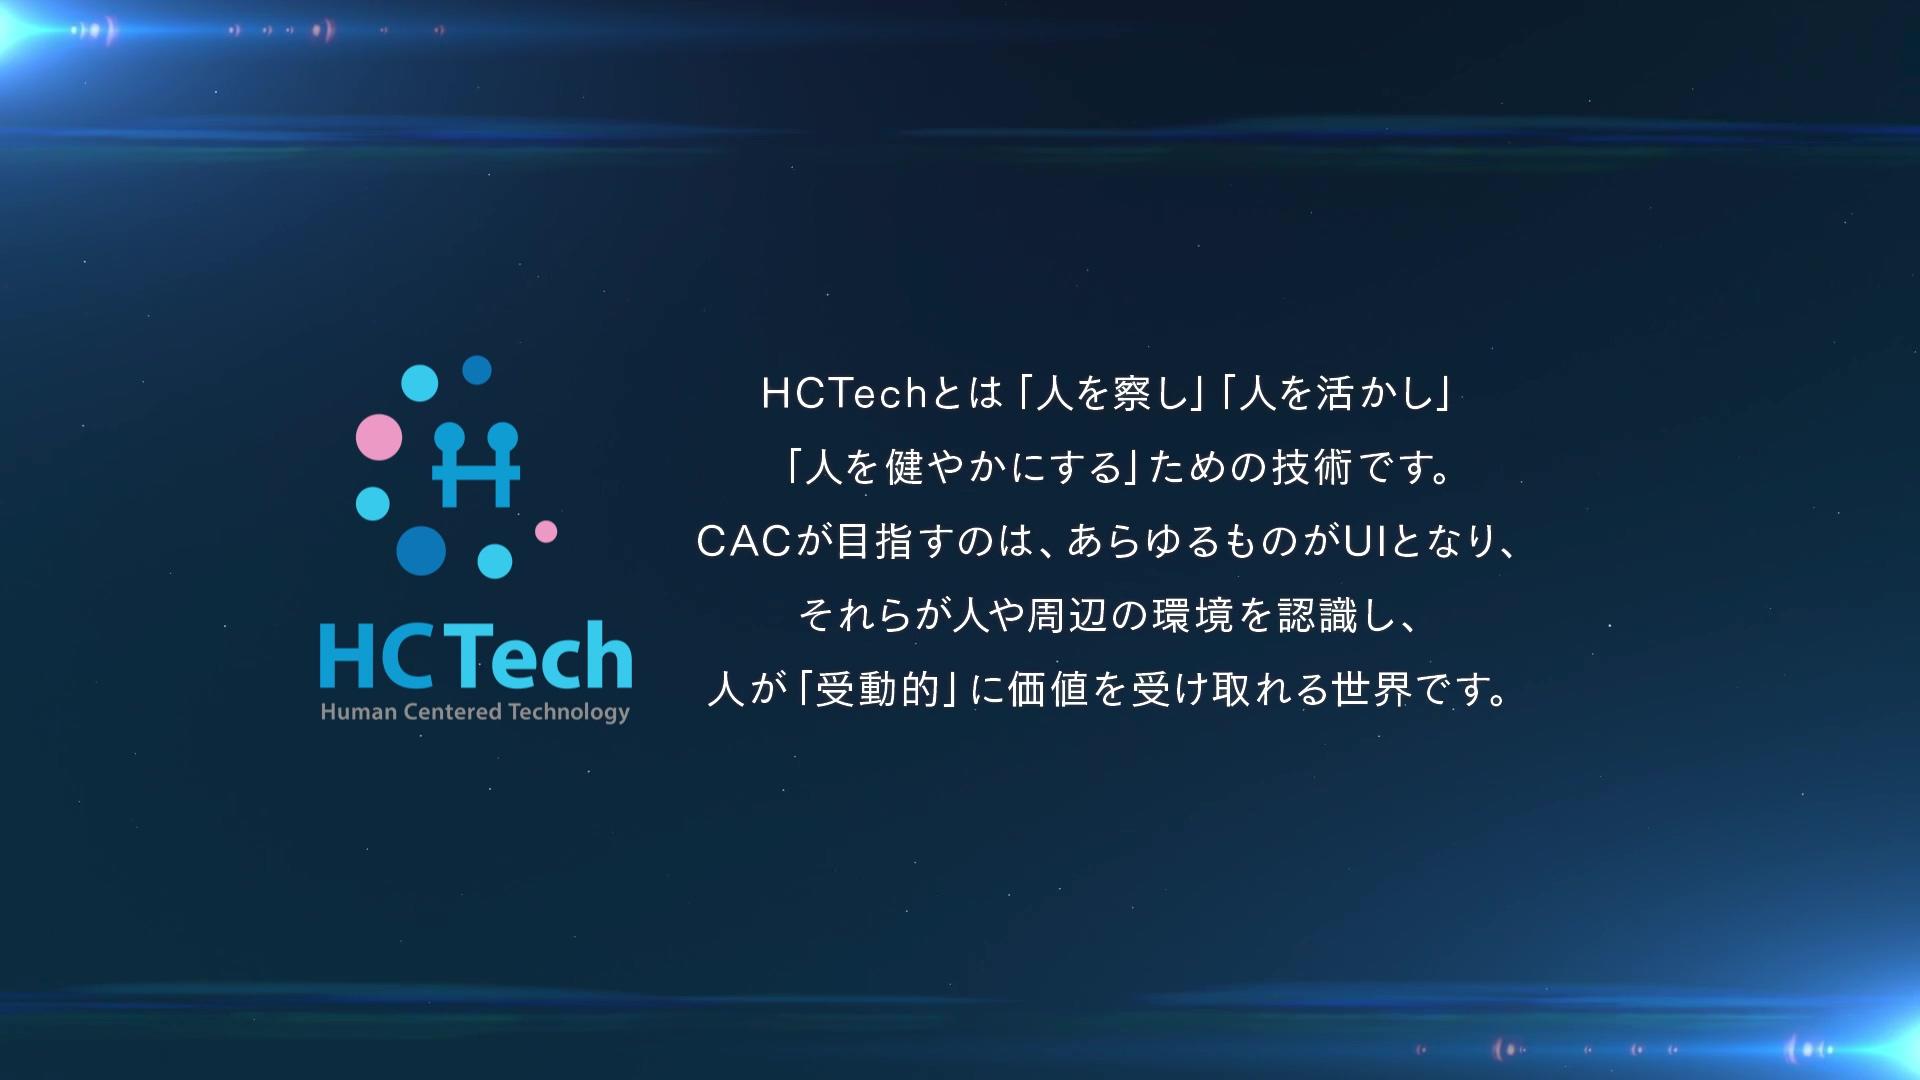 210112_HCTech